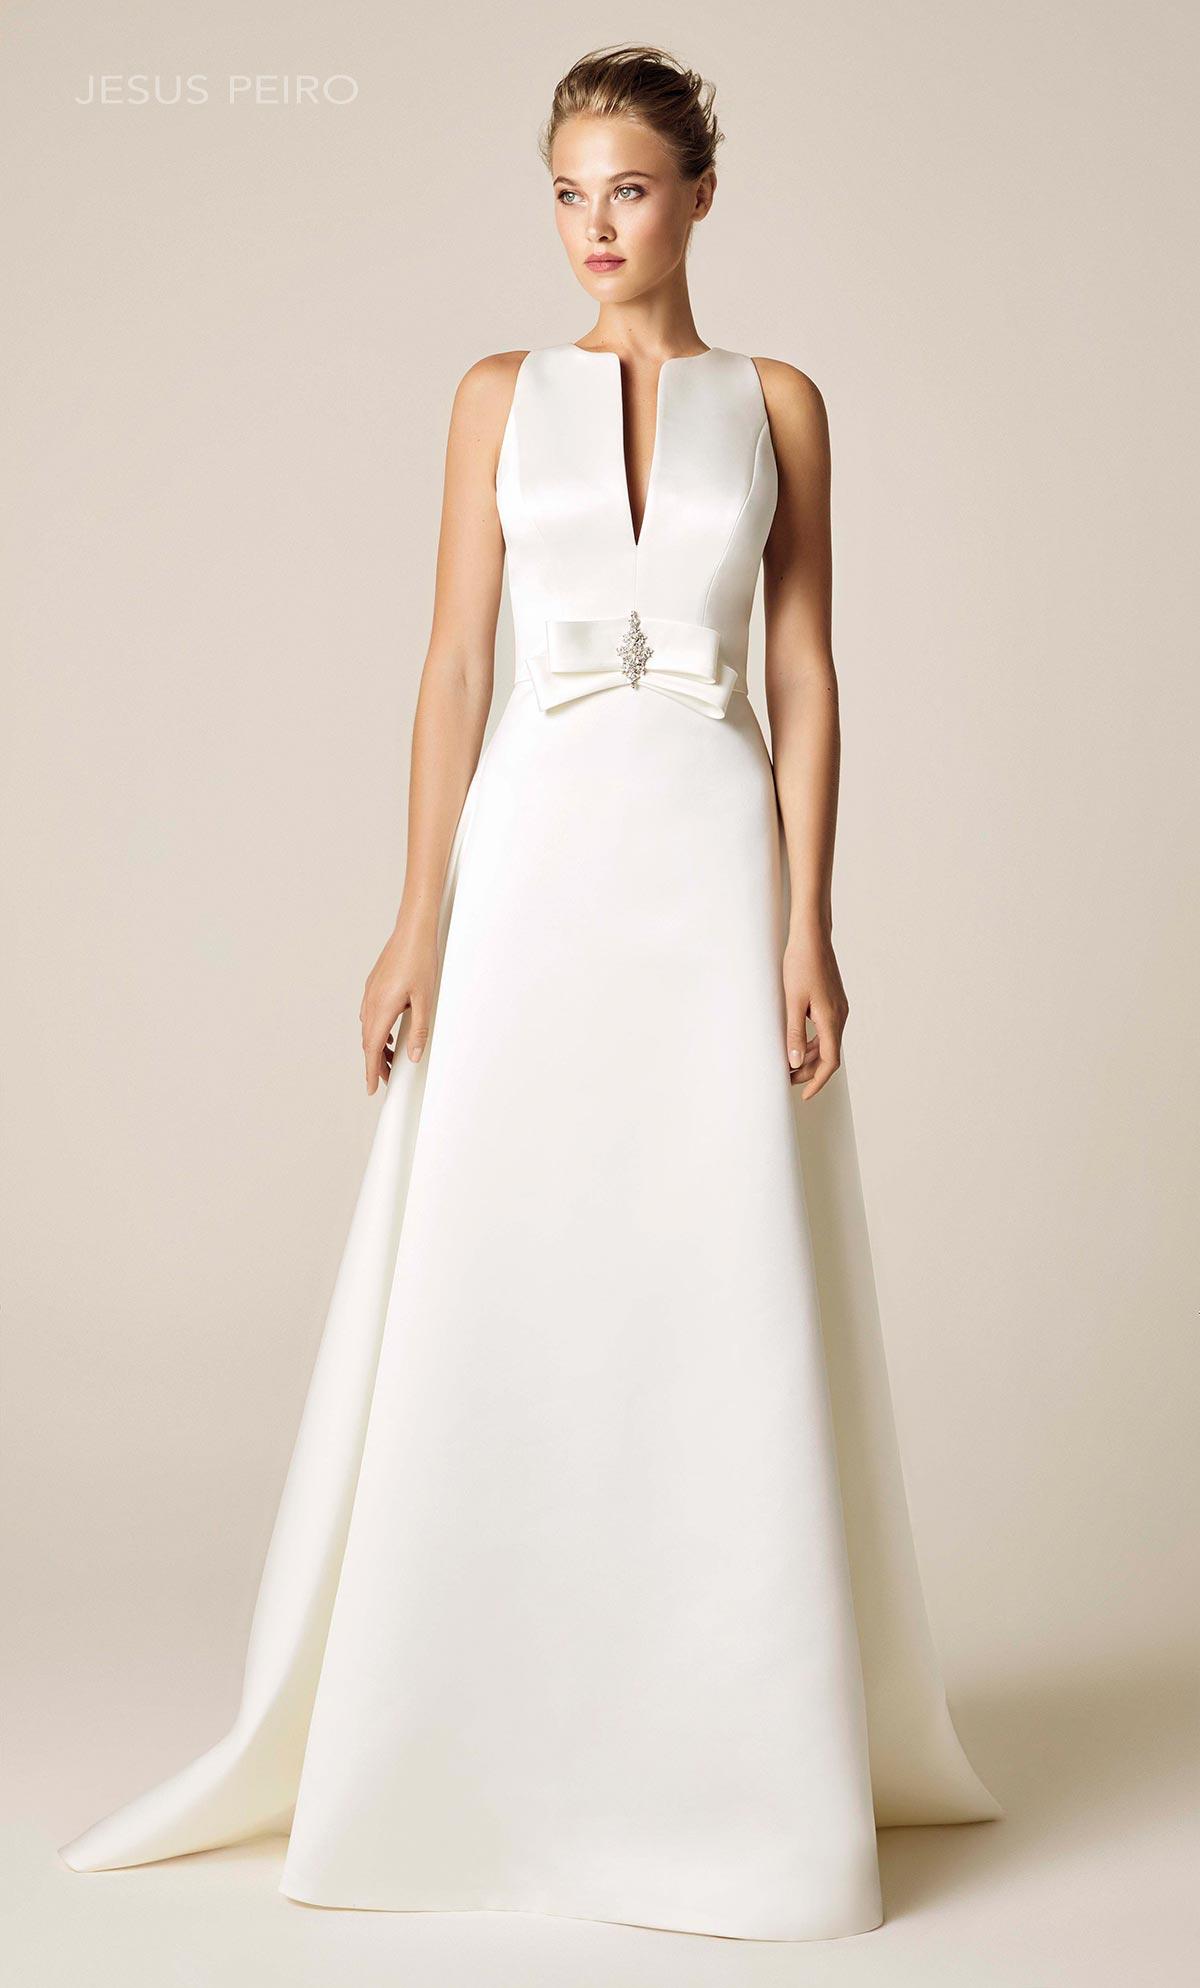 Abiti Da Sposa Jesus Peiro 2018.902 Satin Pencil V Neck Wedding Dressjp2 Bianca Bridal Couture Ny